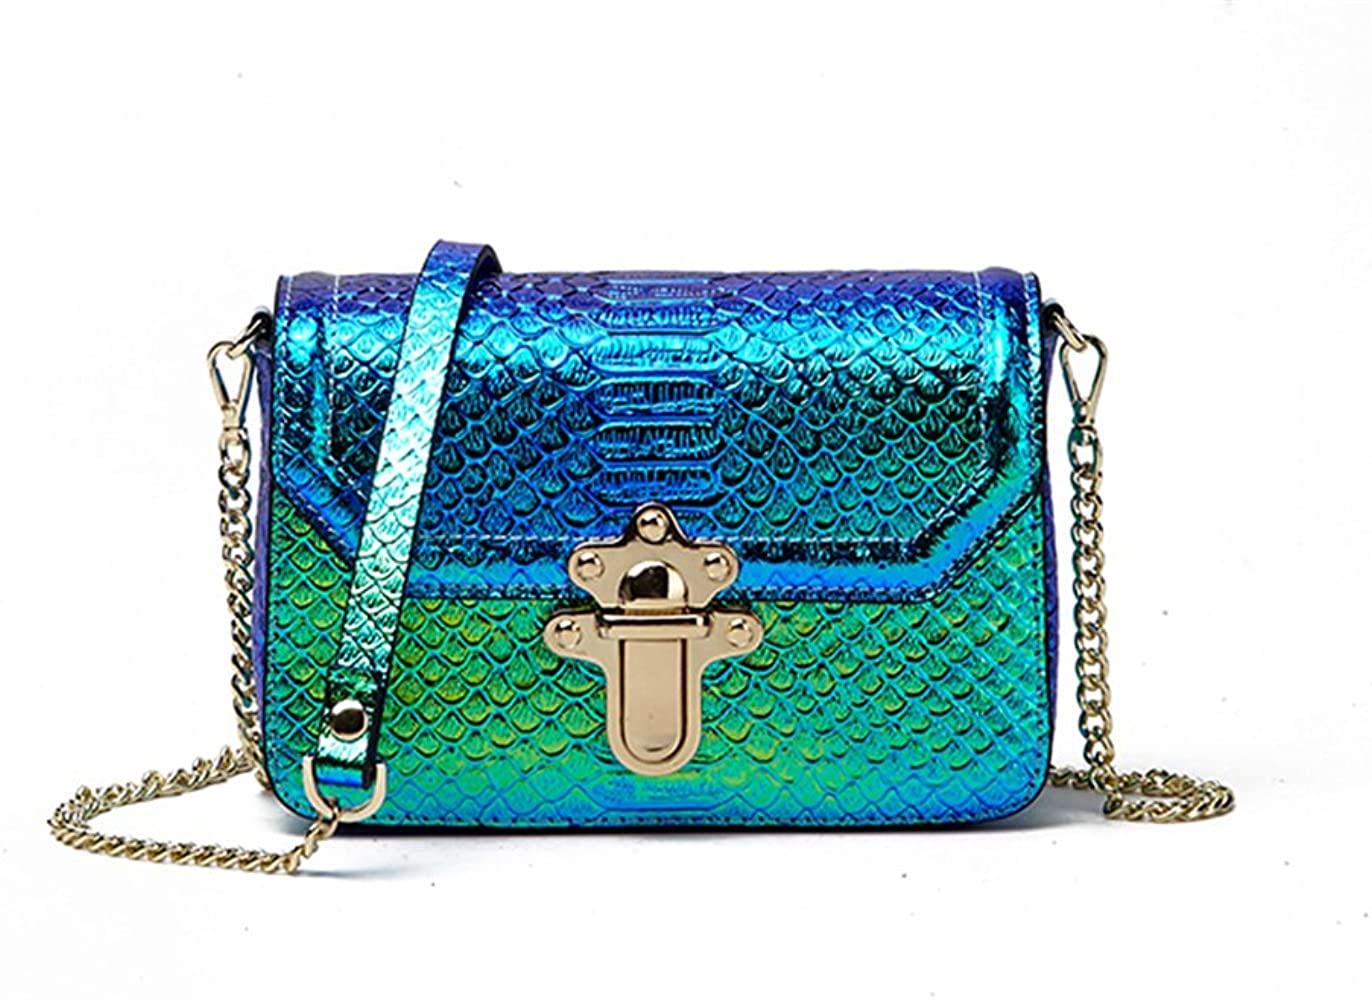 Holographic Snakeskin Crossbody Bag Real Leather Hologram Purse For Women Small Handbags Amazon Com